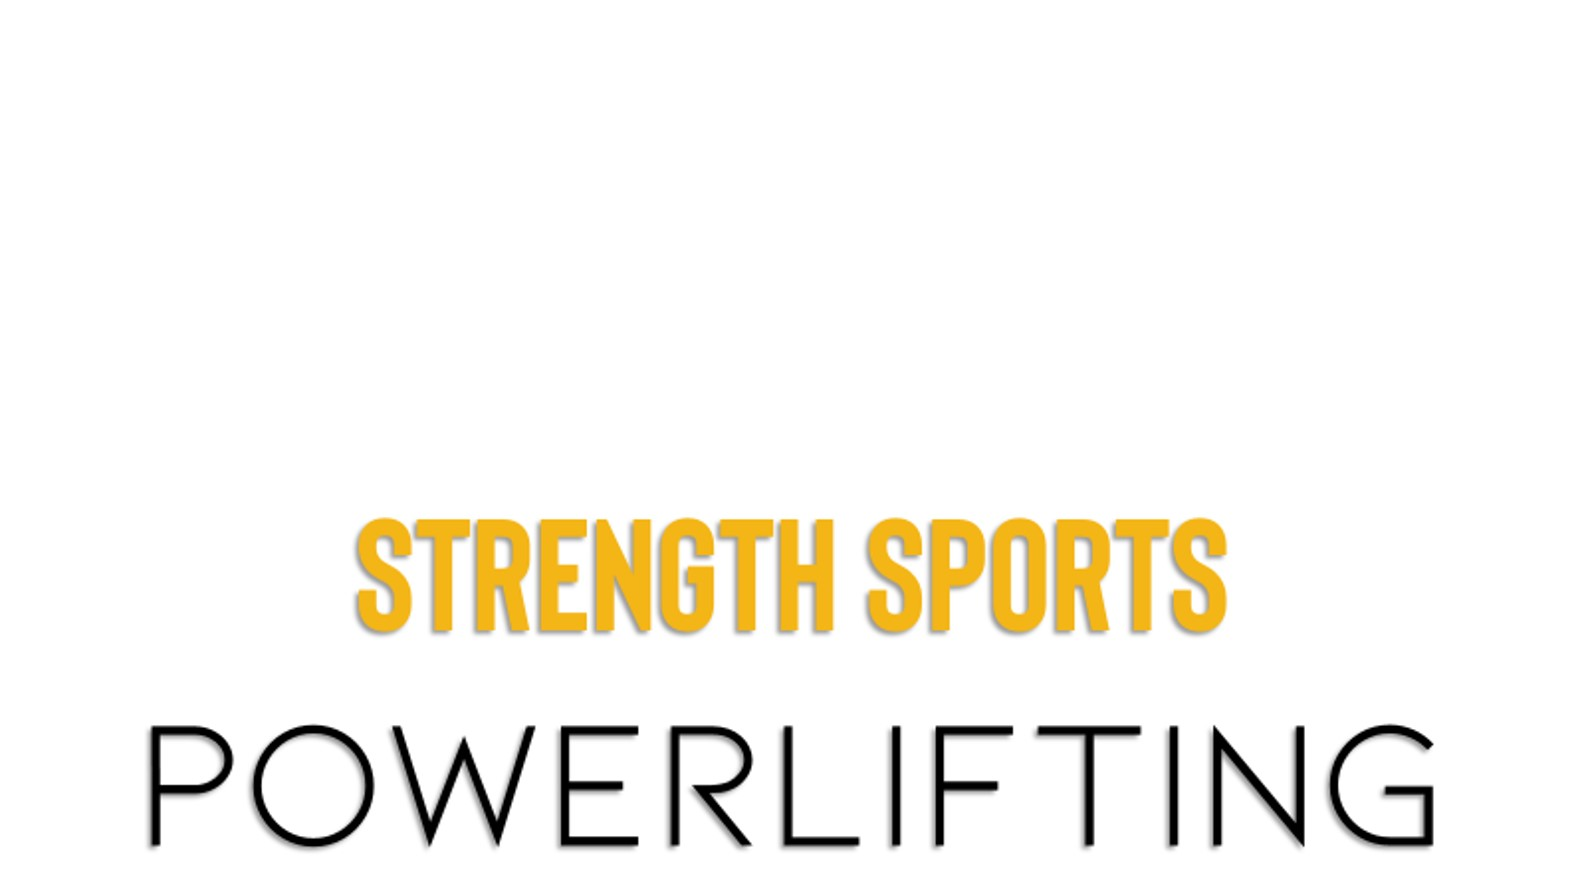 strength sports powerlifting